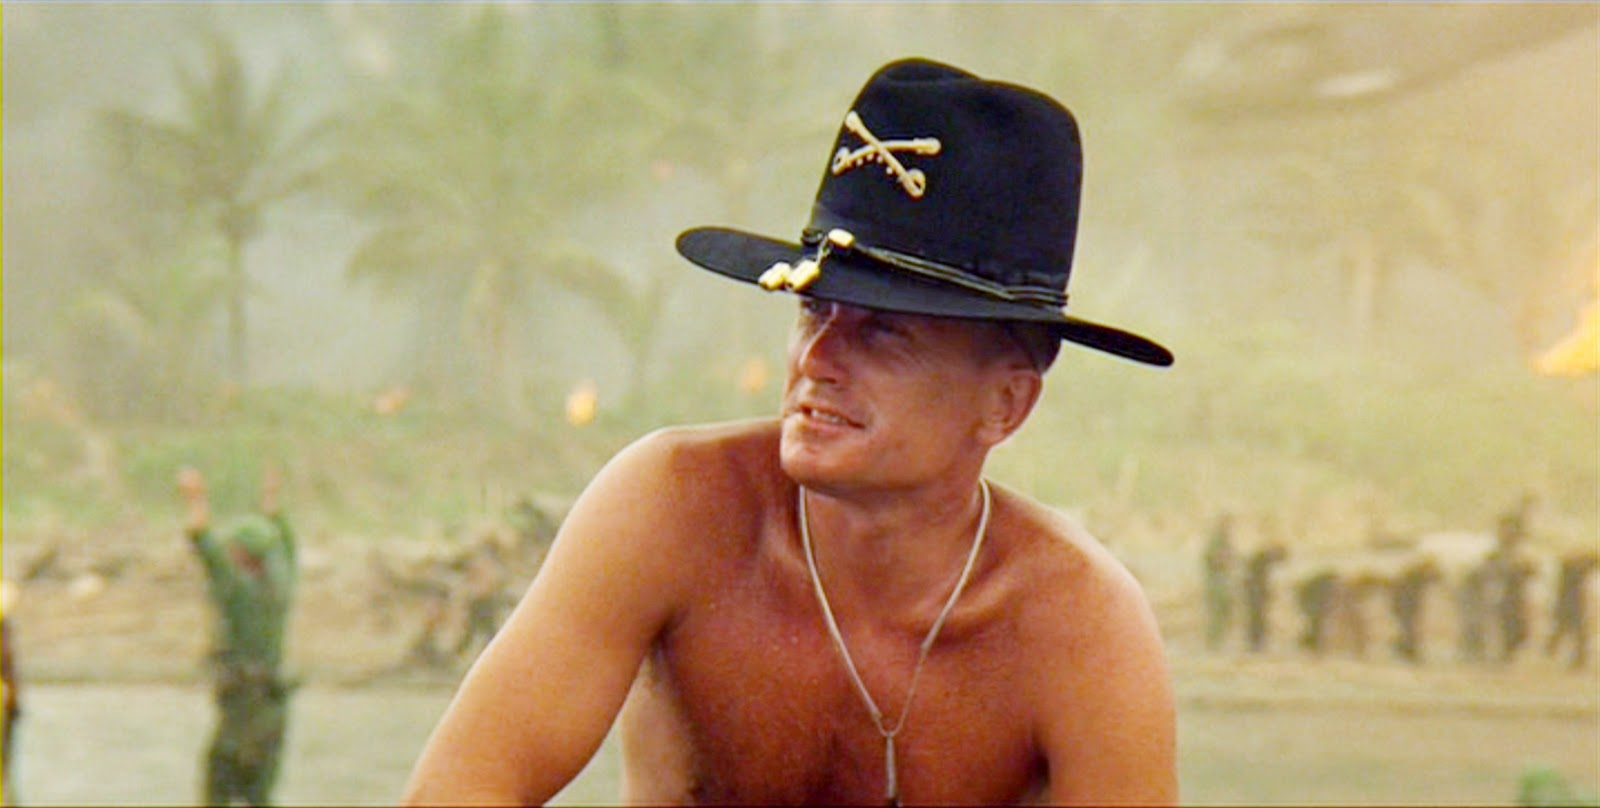 Robert Duvall as Lt. Col Kilgore in Apocalypse Now